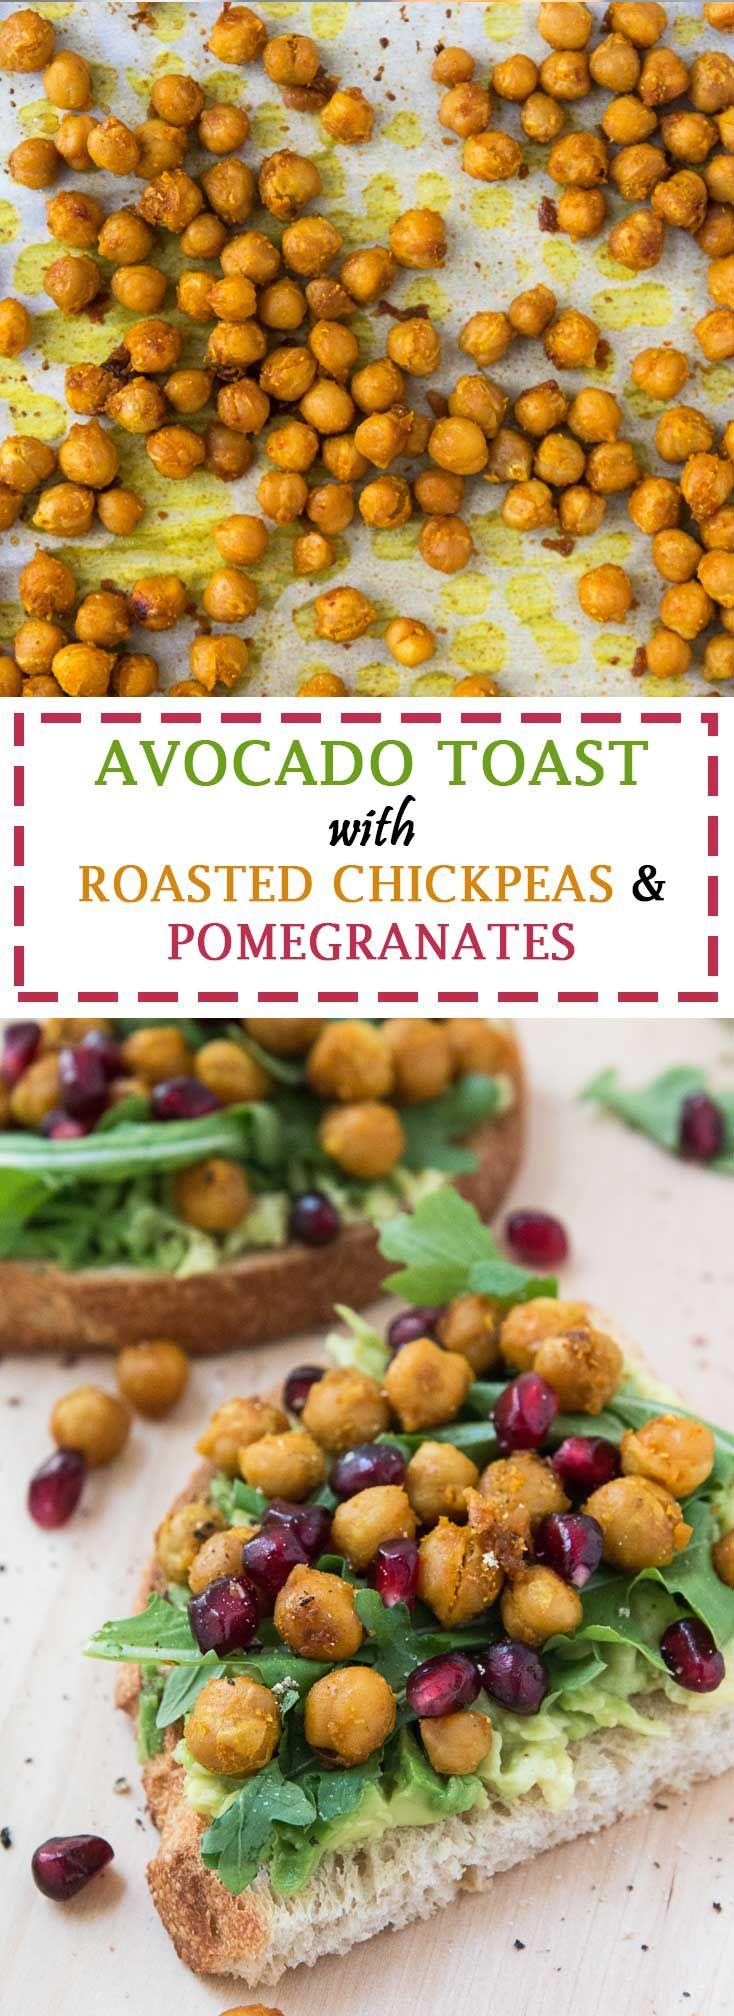 Avocado Toast Recipe with Roasted Chickpeas, Arugula, & Pomegranate Seeds #vegan #glutenfree   www.vegetariangastronomy.com